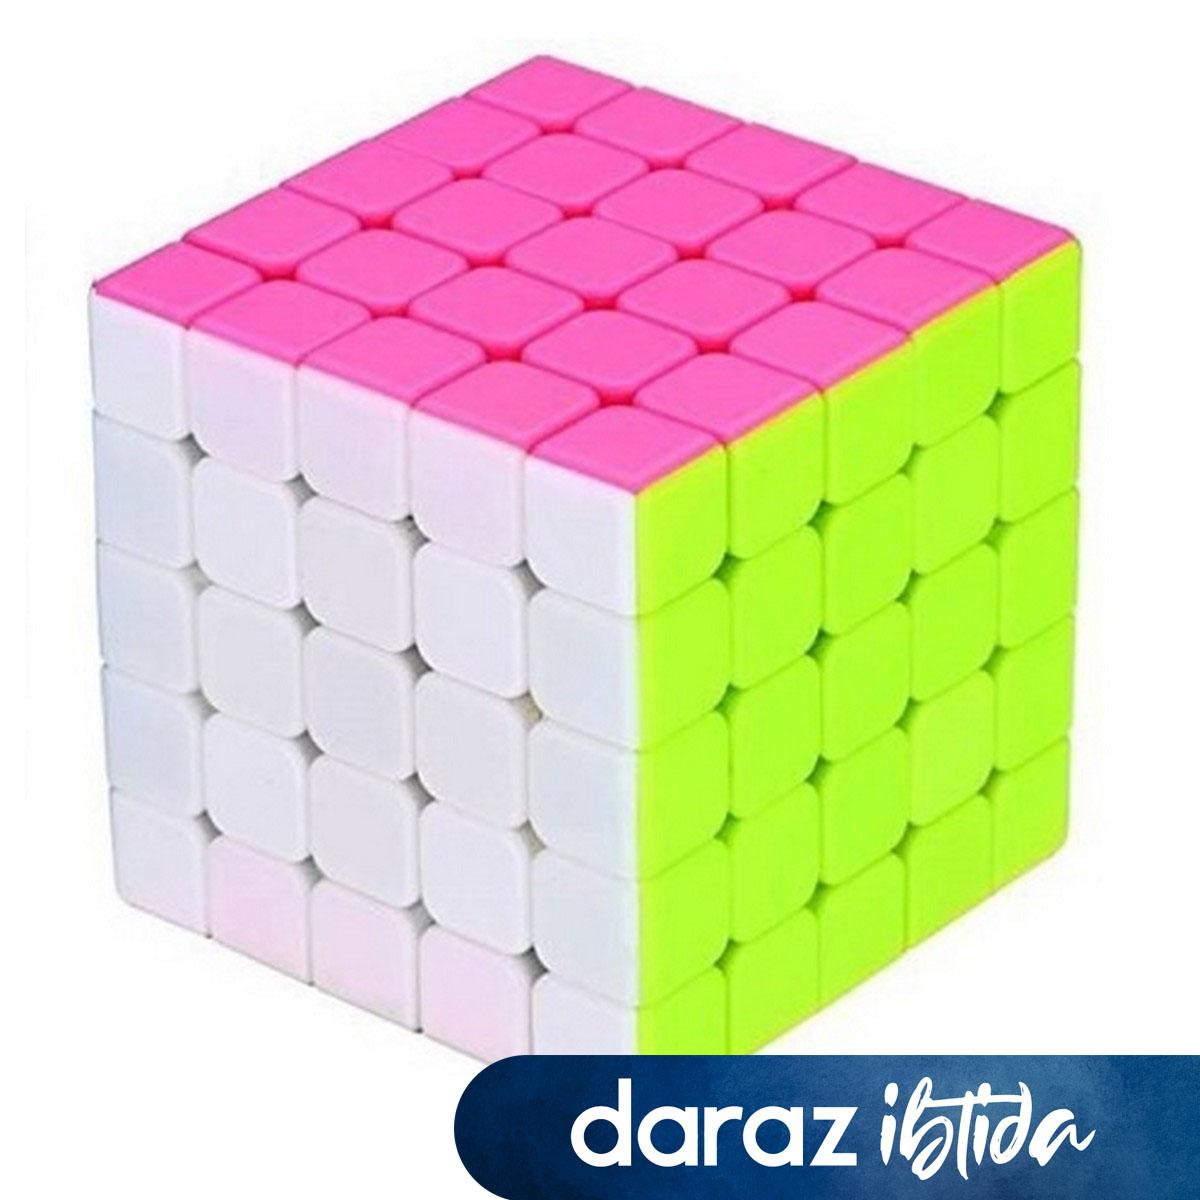 Rubik's Cube 5X5 Qiyi Qizheng Sticker less Best Quality Fast Speed Magic Cube Educational Puzzle Toys